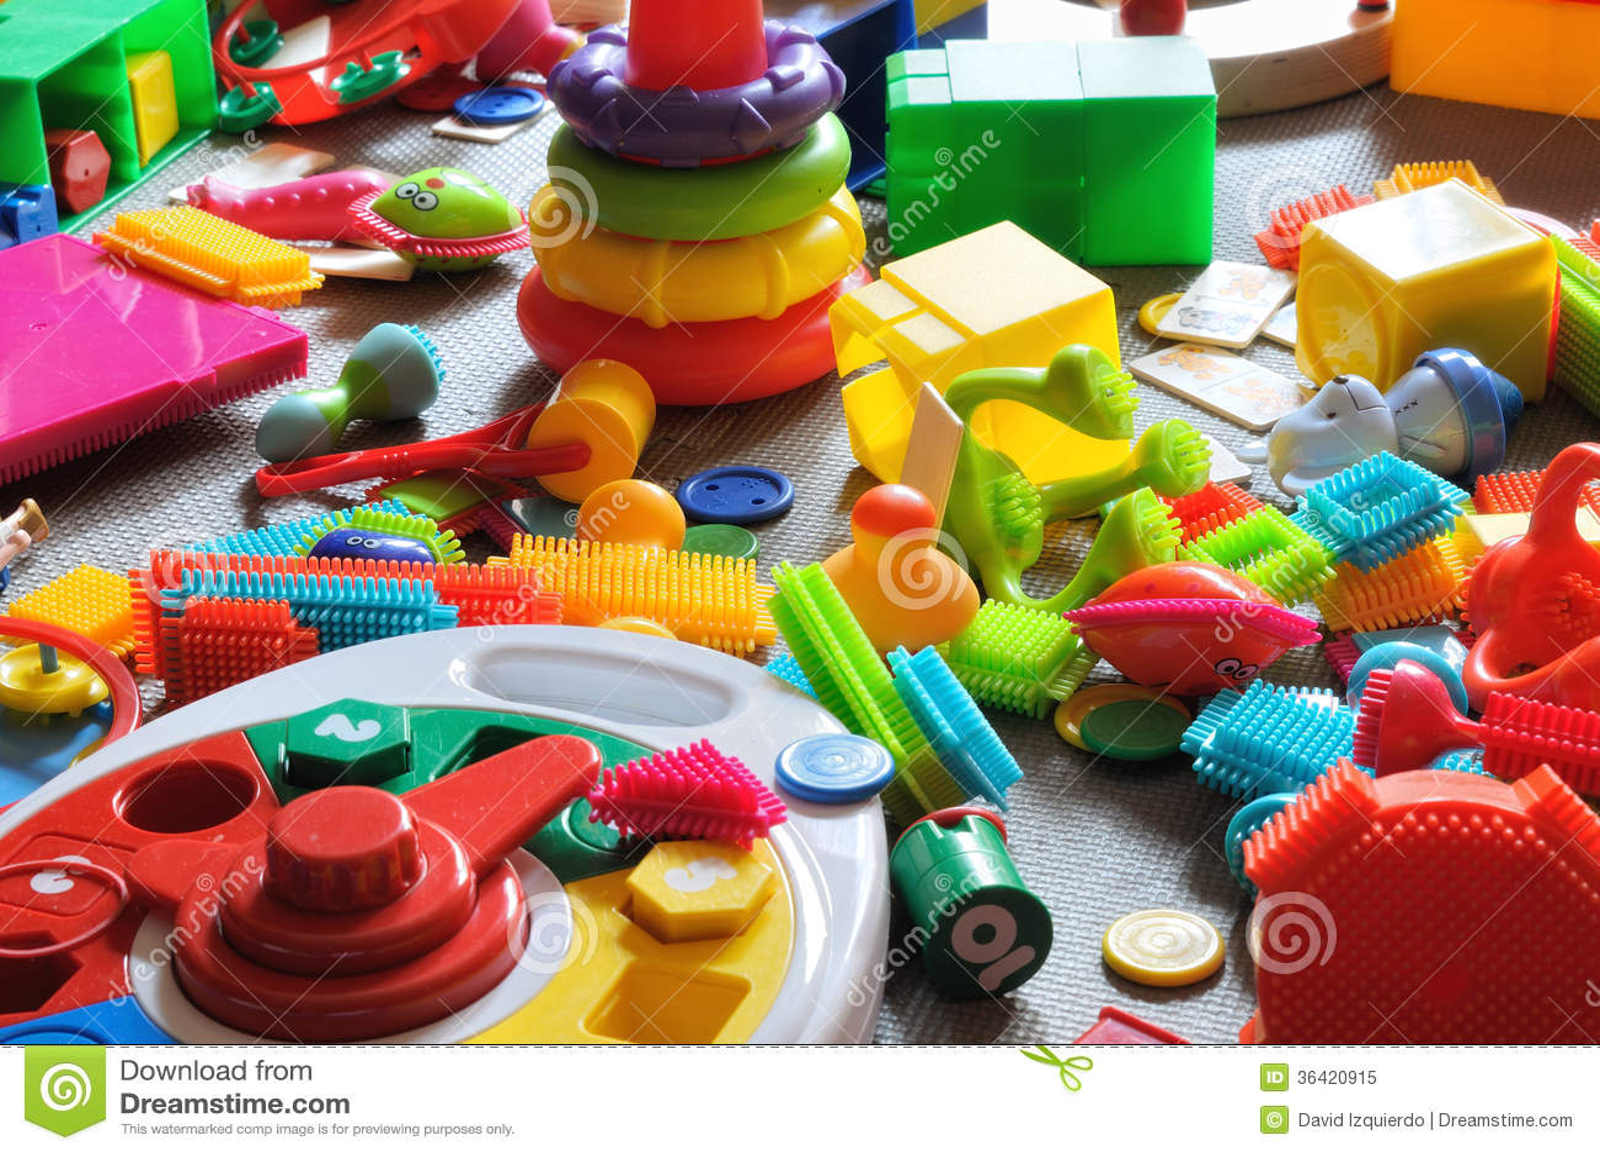 Områdesbarns leksaker